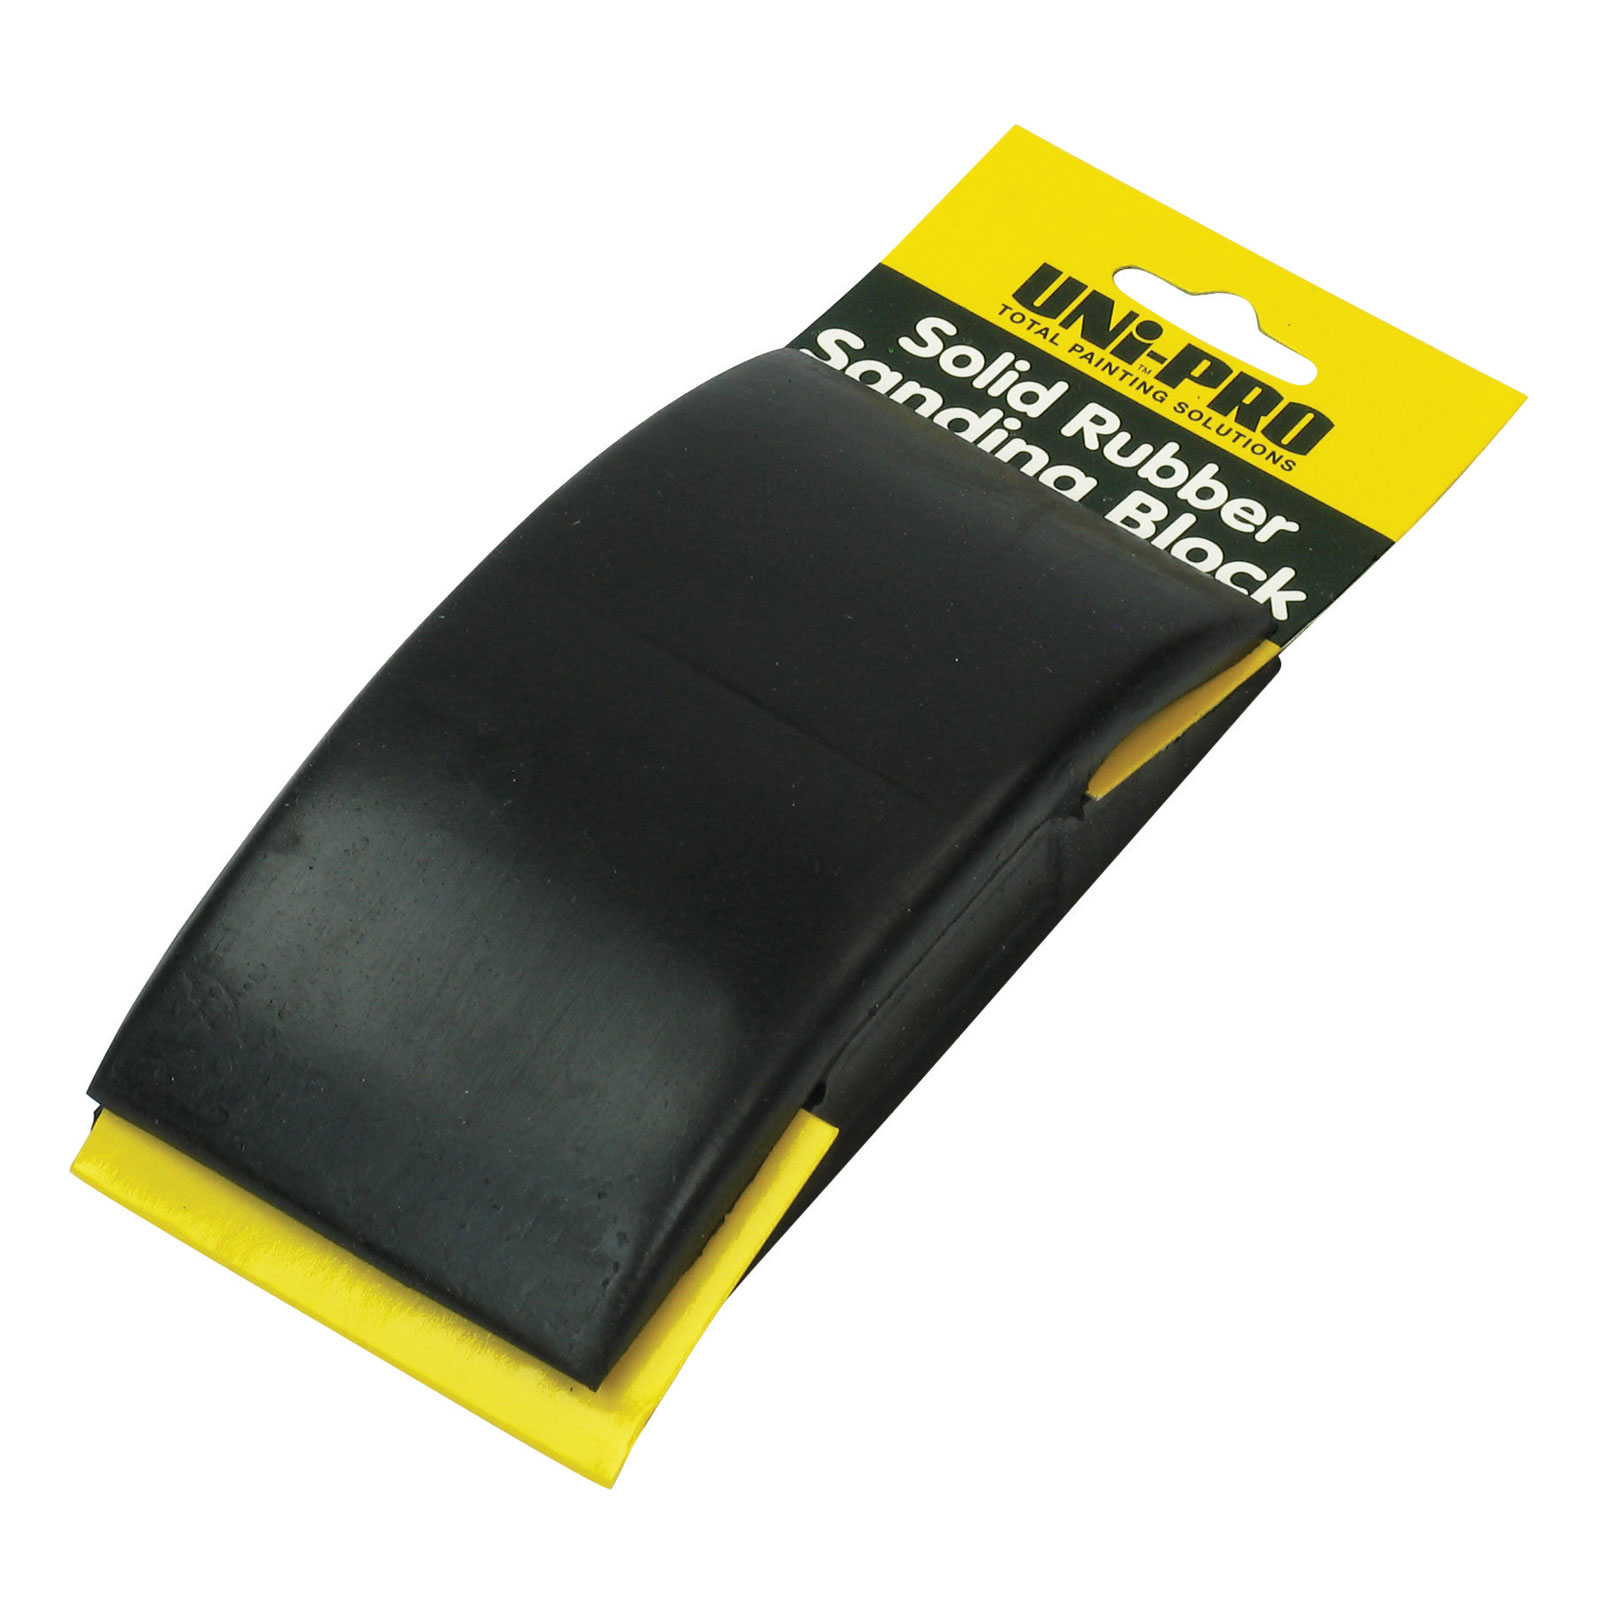 UNi-PRO Rubber Sanding Block Wet & Dry